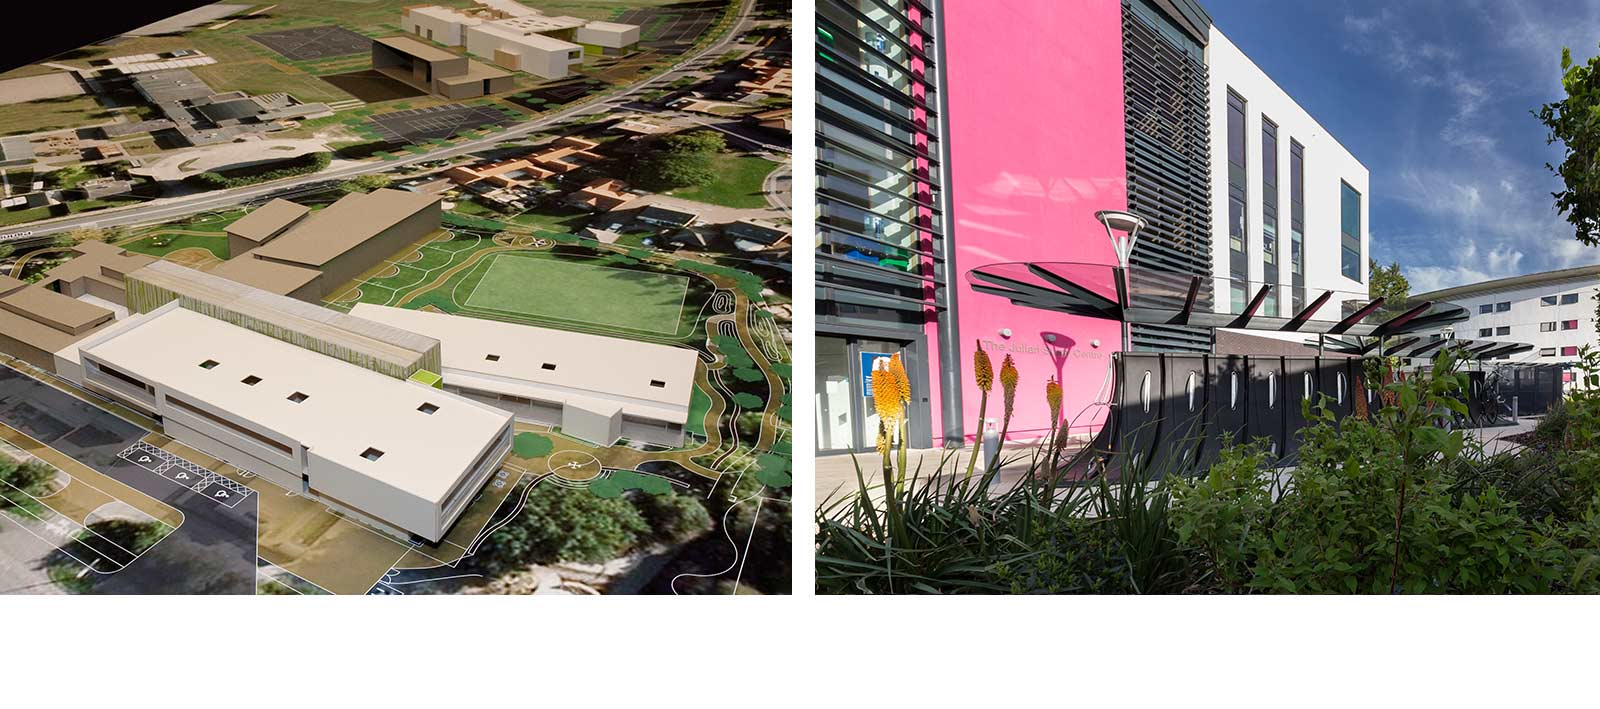 Landscape design overview of landscape and building with planting